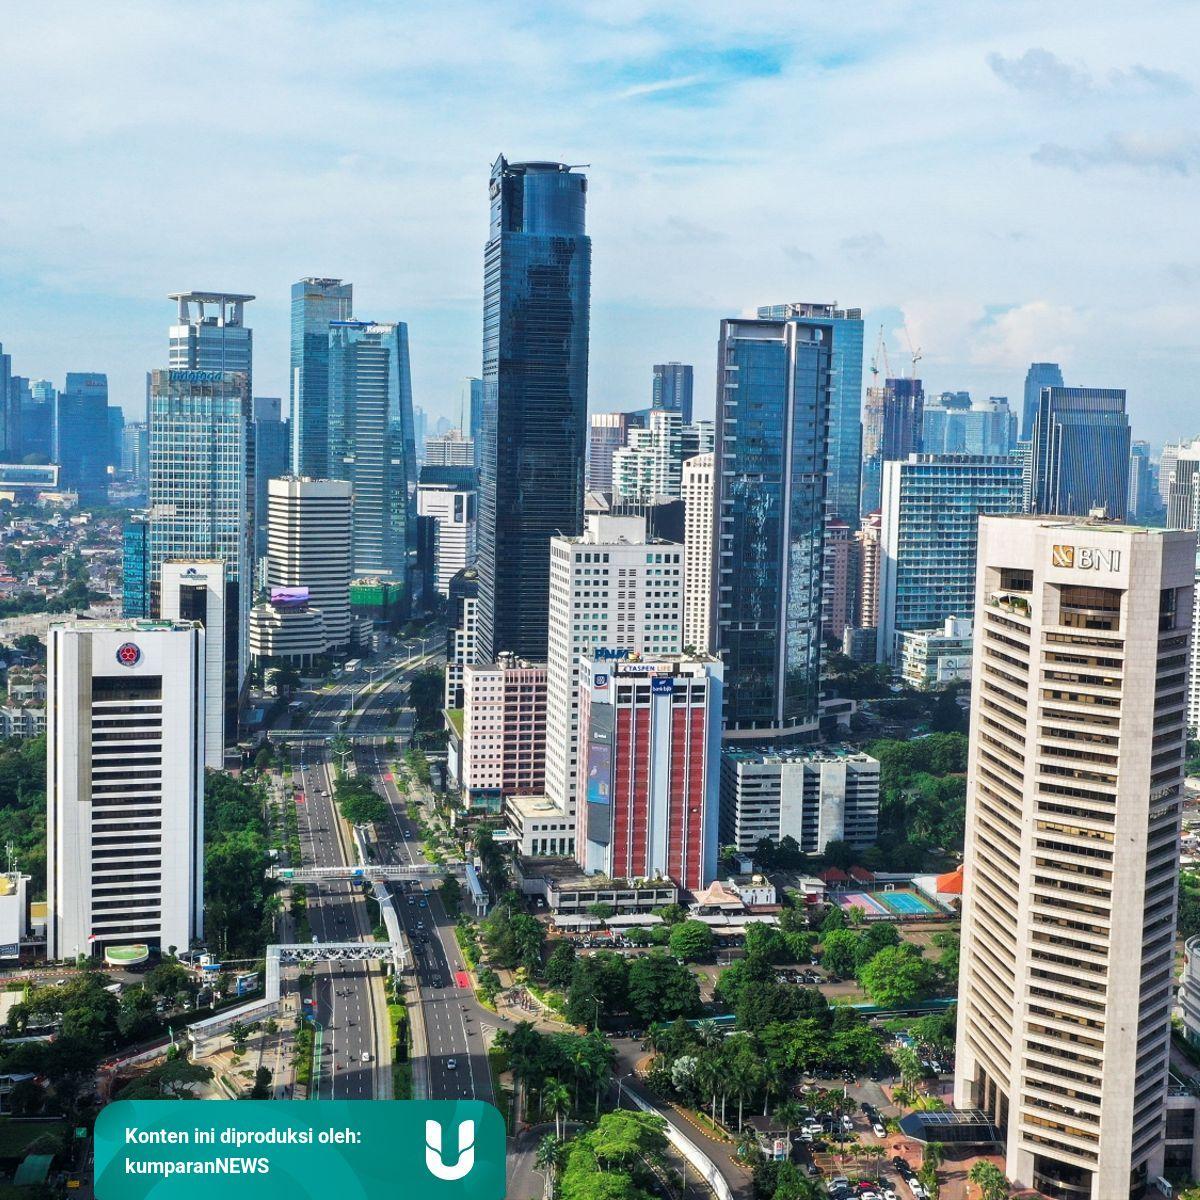 Foto Kualitas Udara Di Jakarta Semakin Baik Kumparan Com